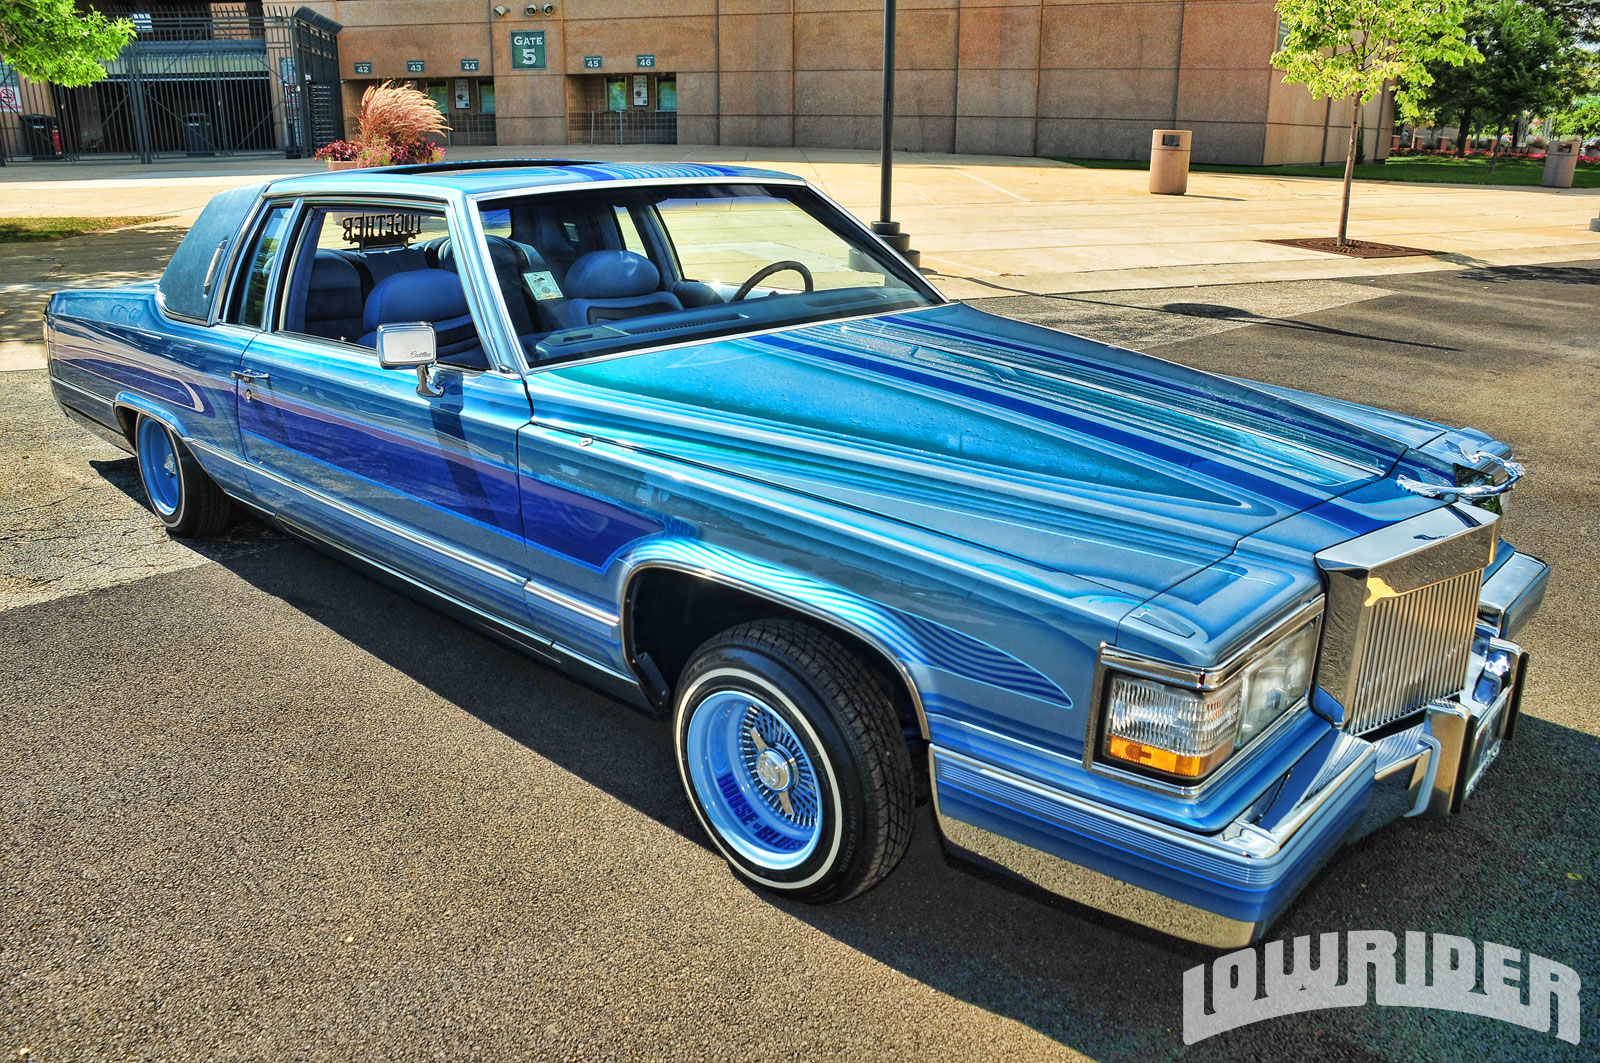 1982 Cadillac Coupe De Ville - Lowrider Magazine